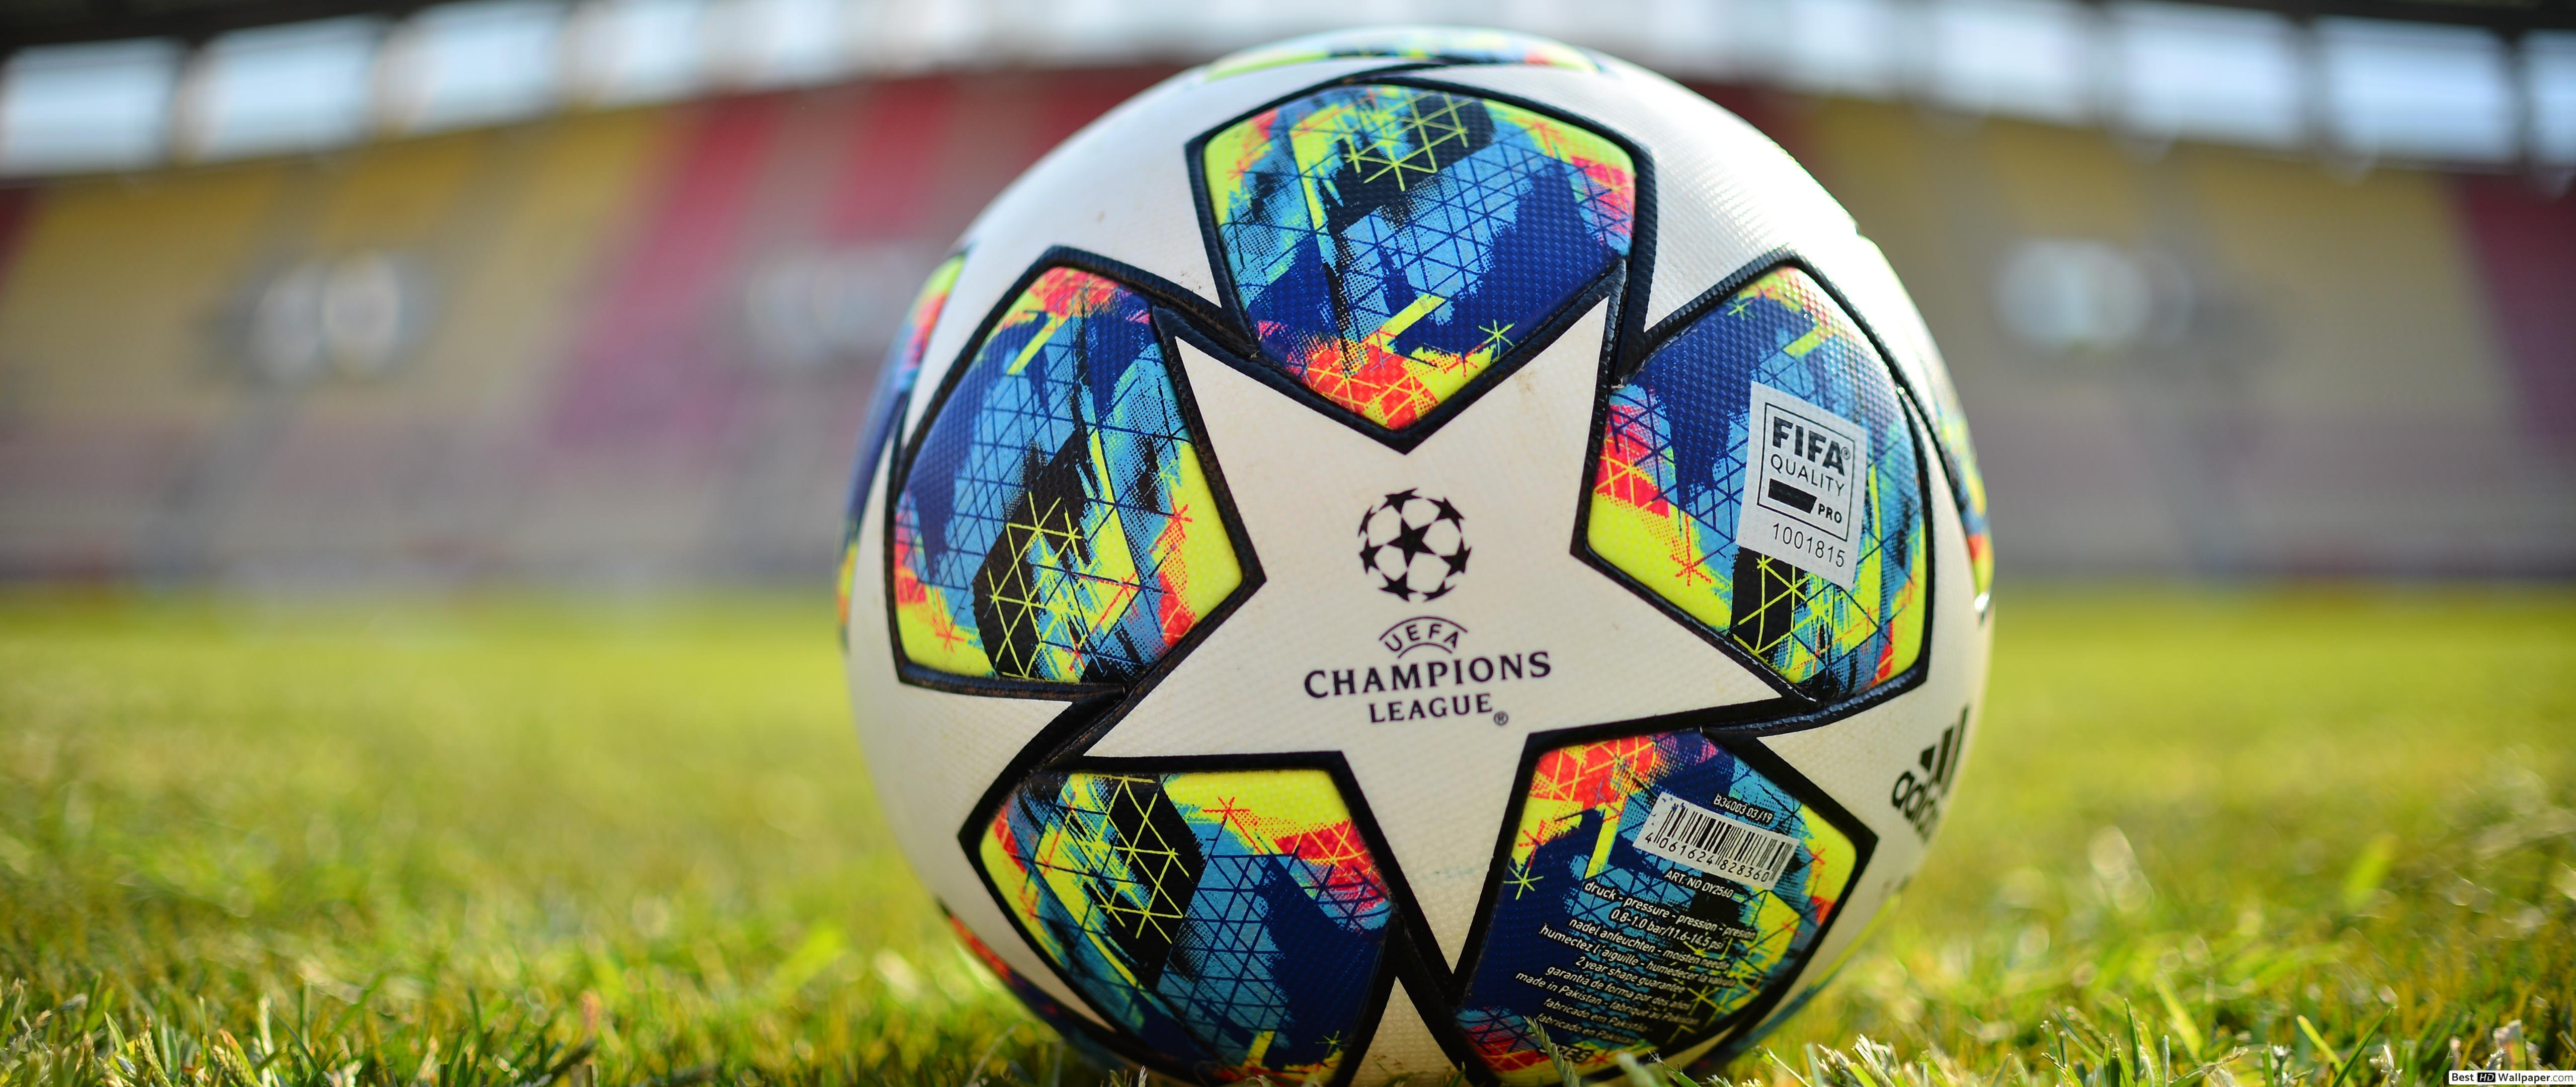 Uefa Champions League 2020 Wallpaper 5120x2160